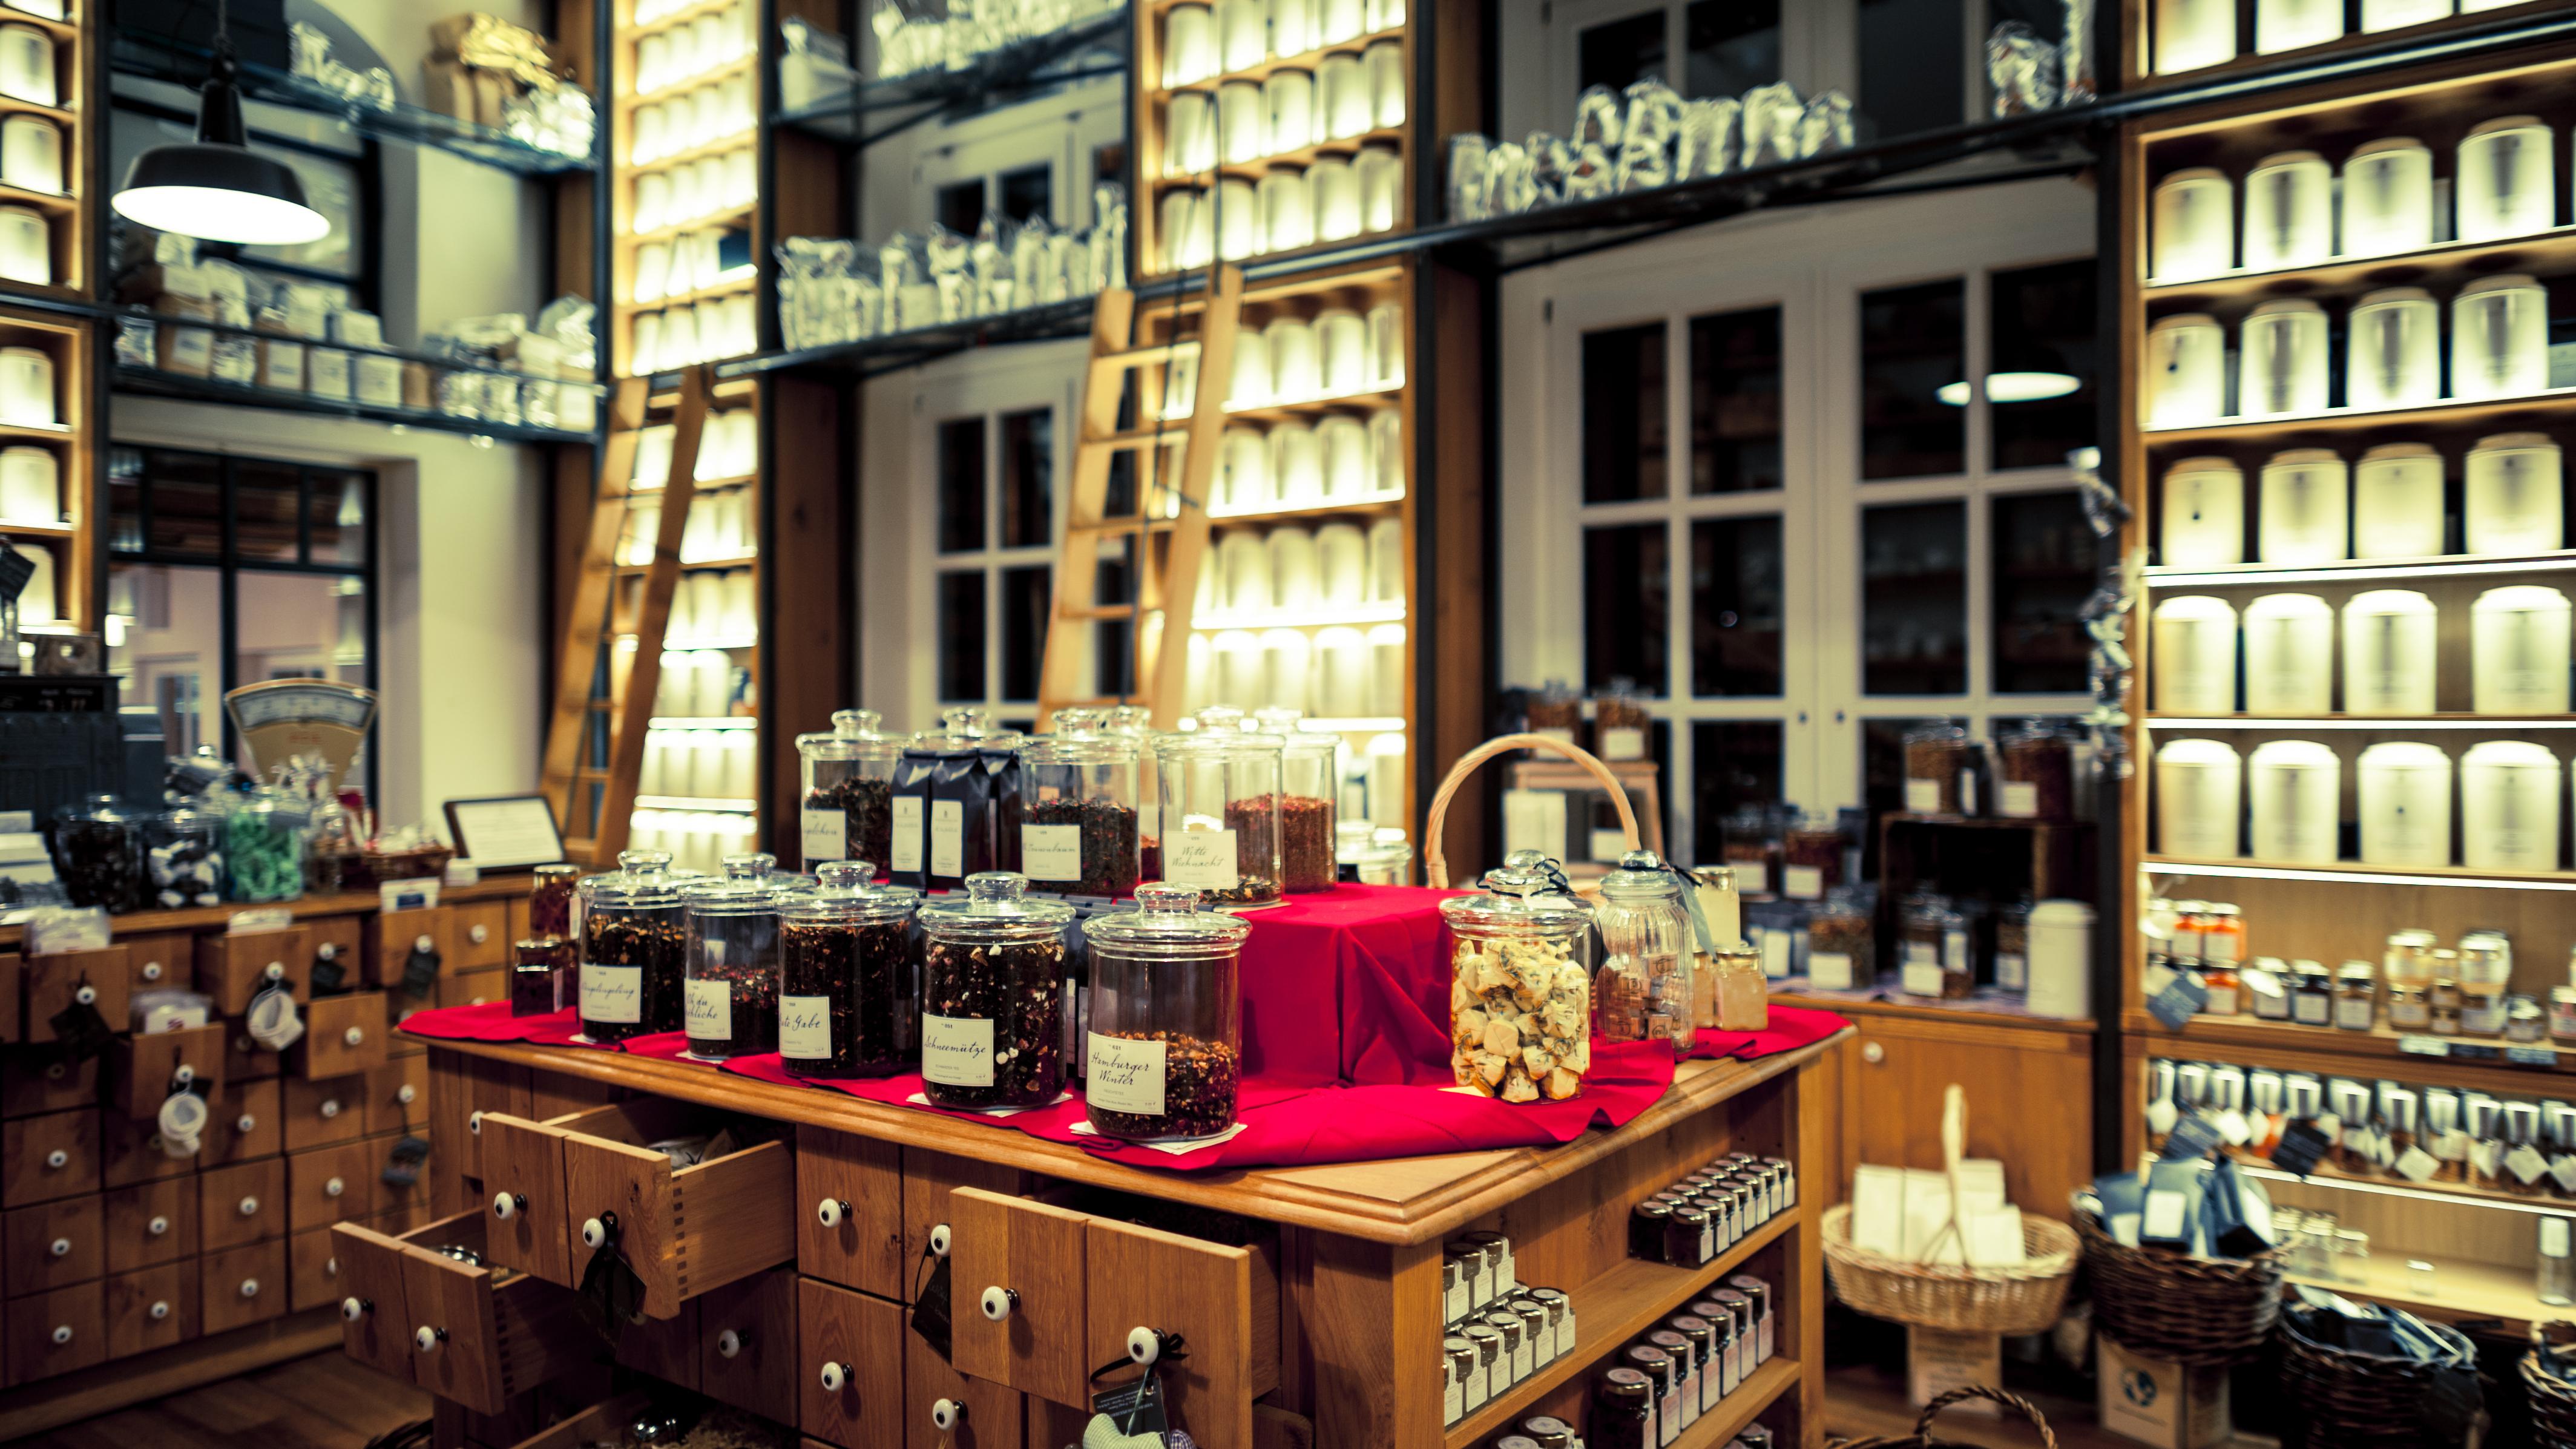 Yuuki-cha Tea_shop_wasserschloss_by_k_a_n_e-d5q2u5t